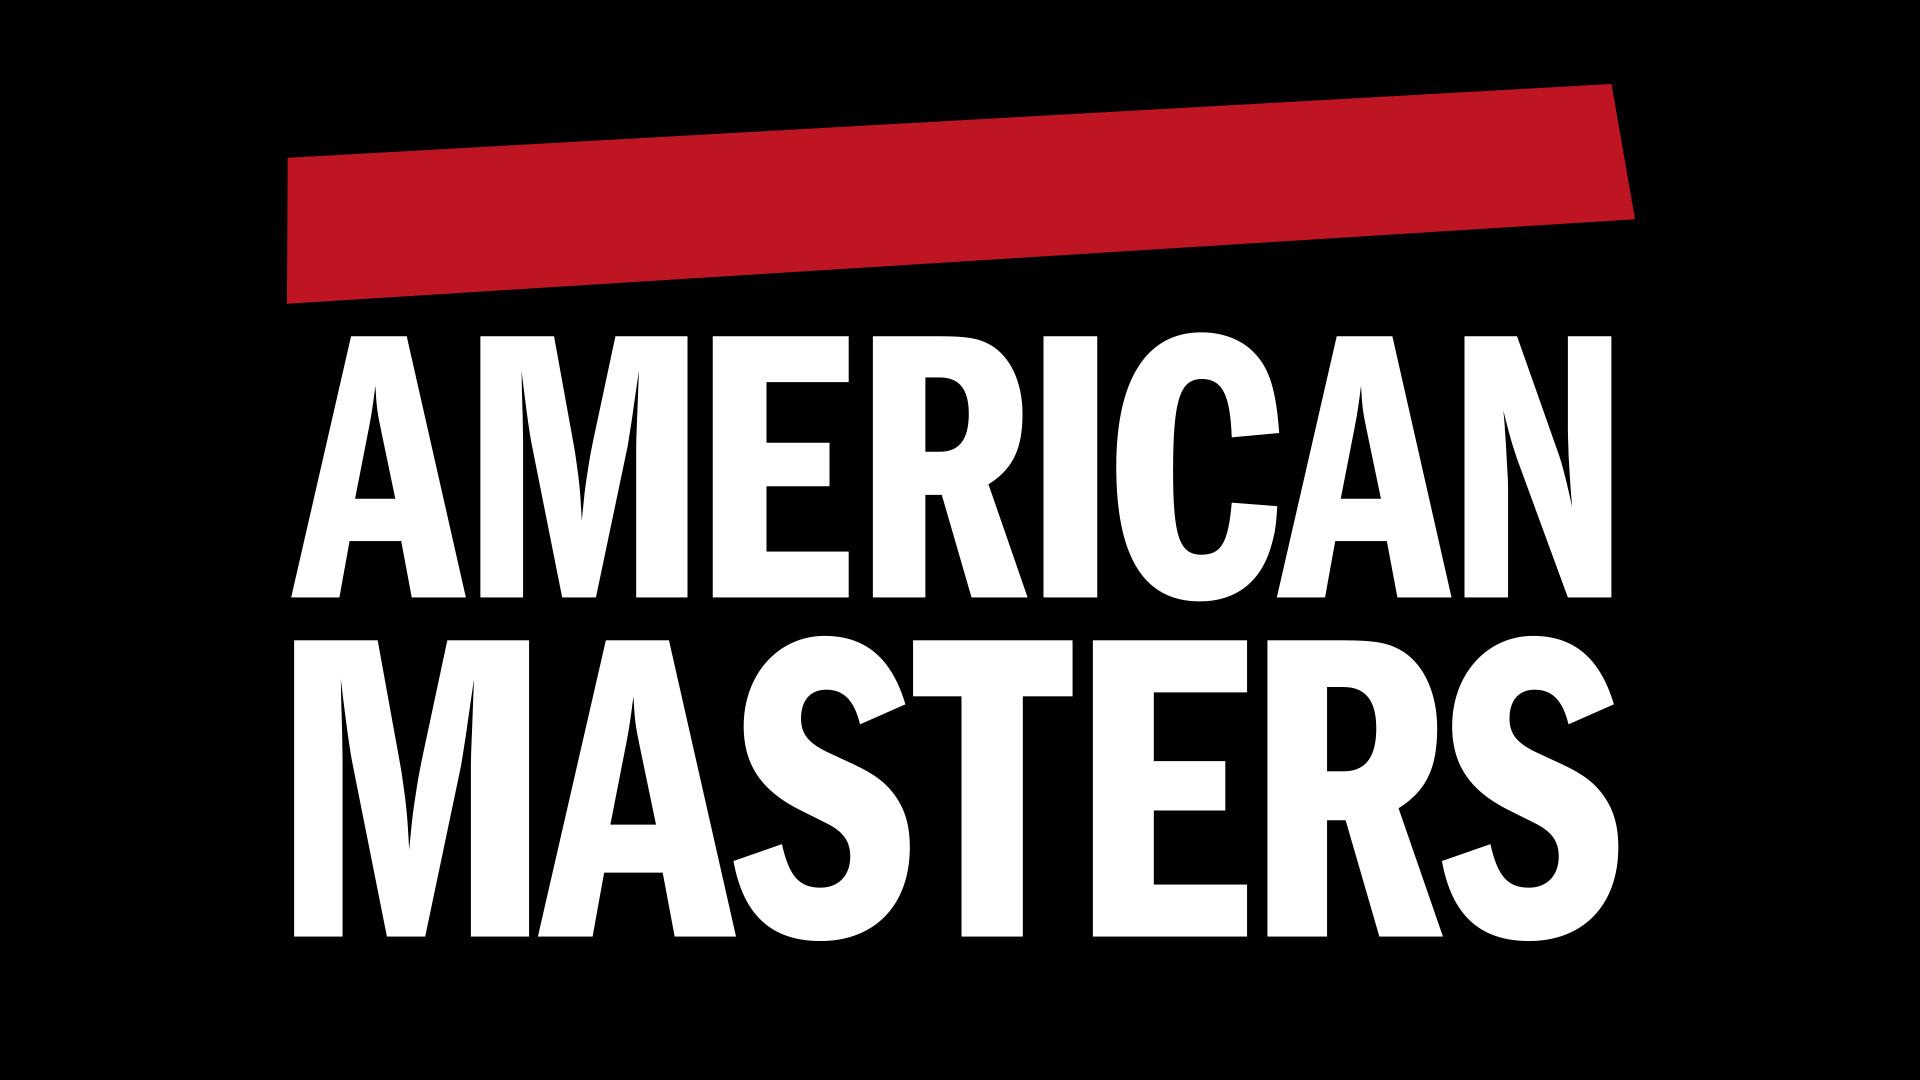 American-Masters1920x1080 Mezzanine.jpg